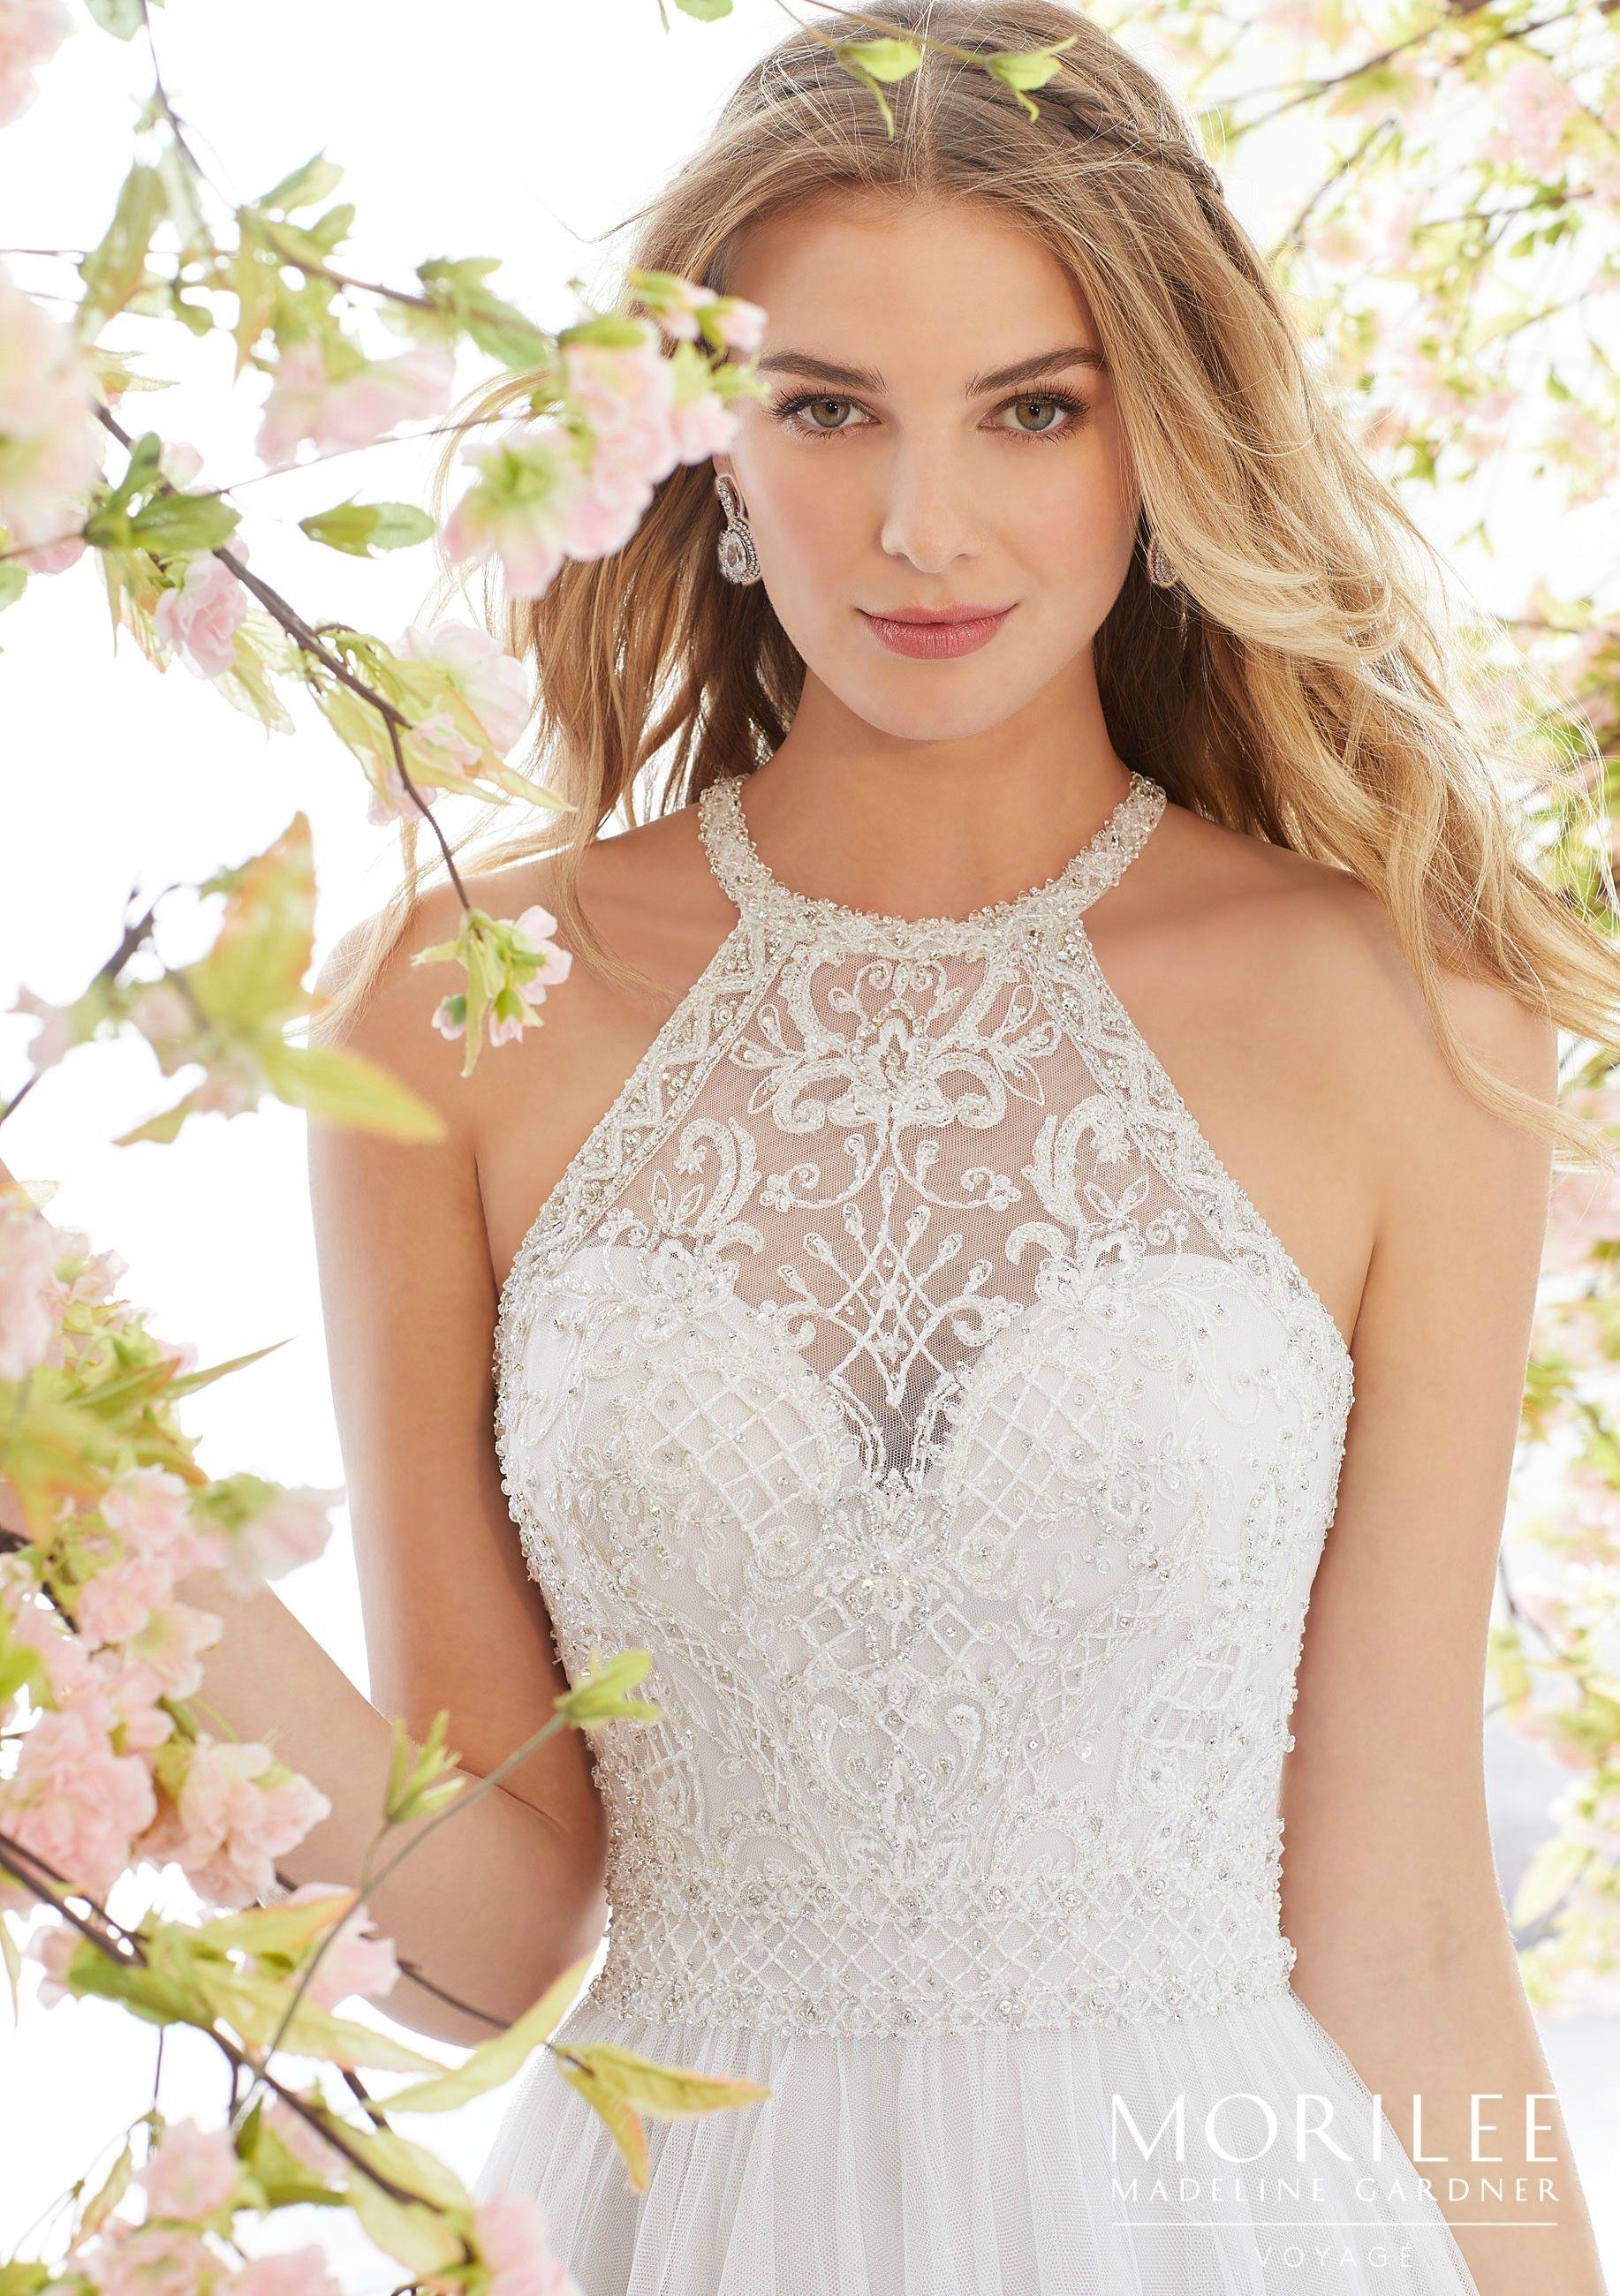 Leilani Wedding Dress Morilee Wedding Dress Accessories Perfect Wedding Dress Wedding Dresses Vintage